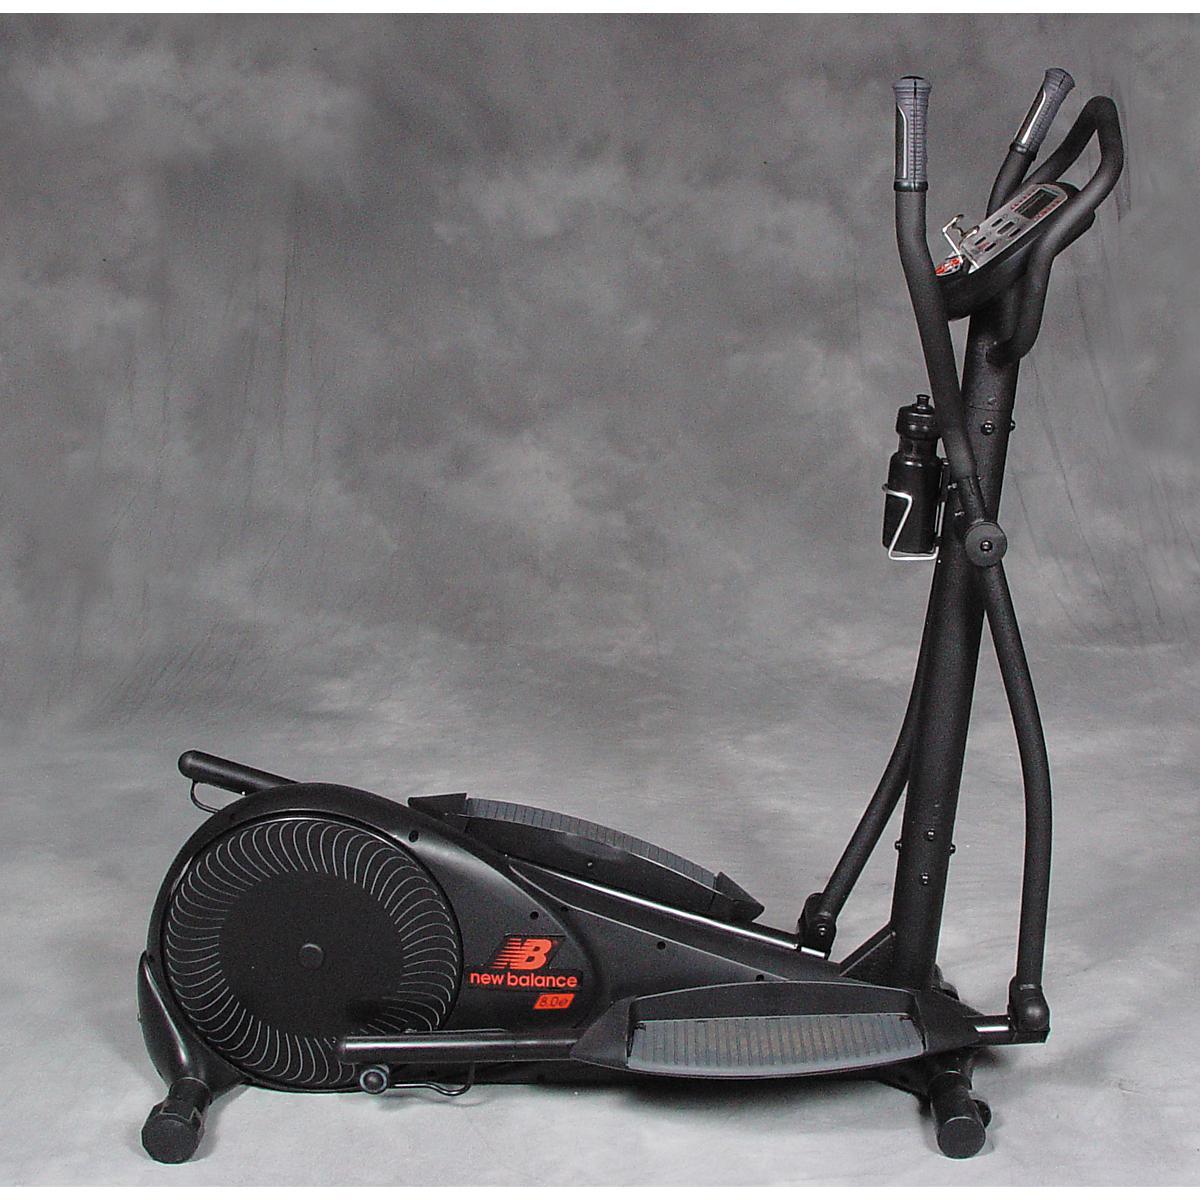 New Balance 8.0e Elliptical Trainer Fitness Equipment At